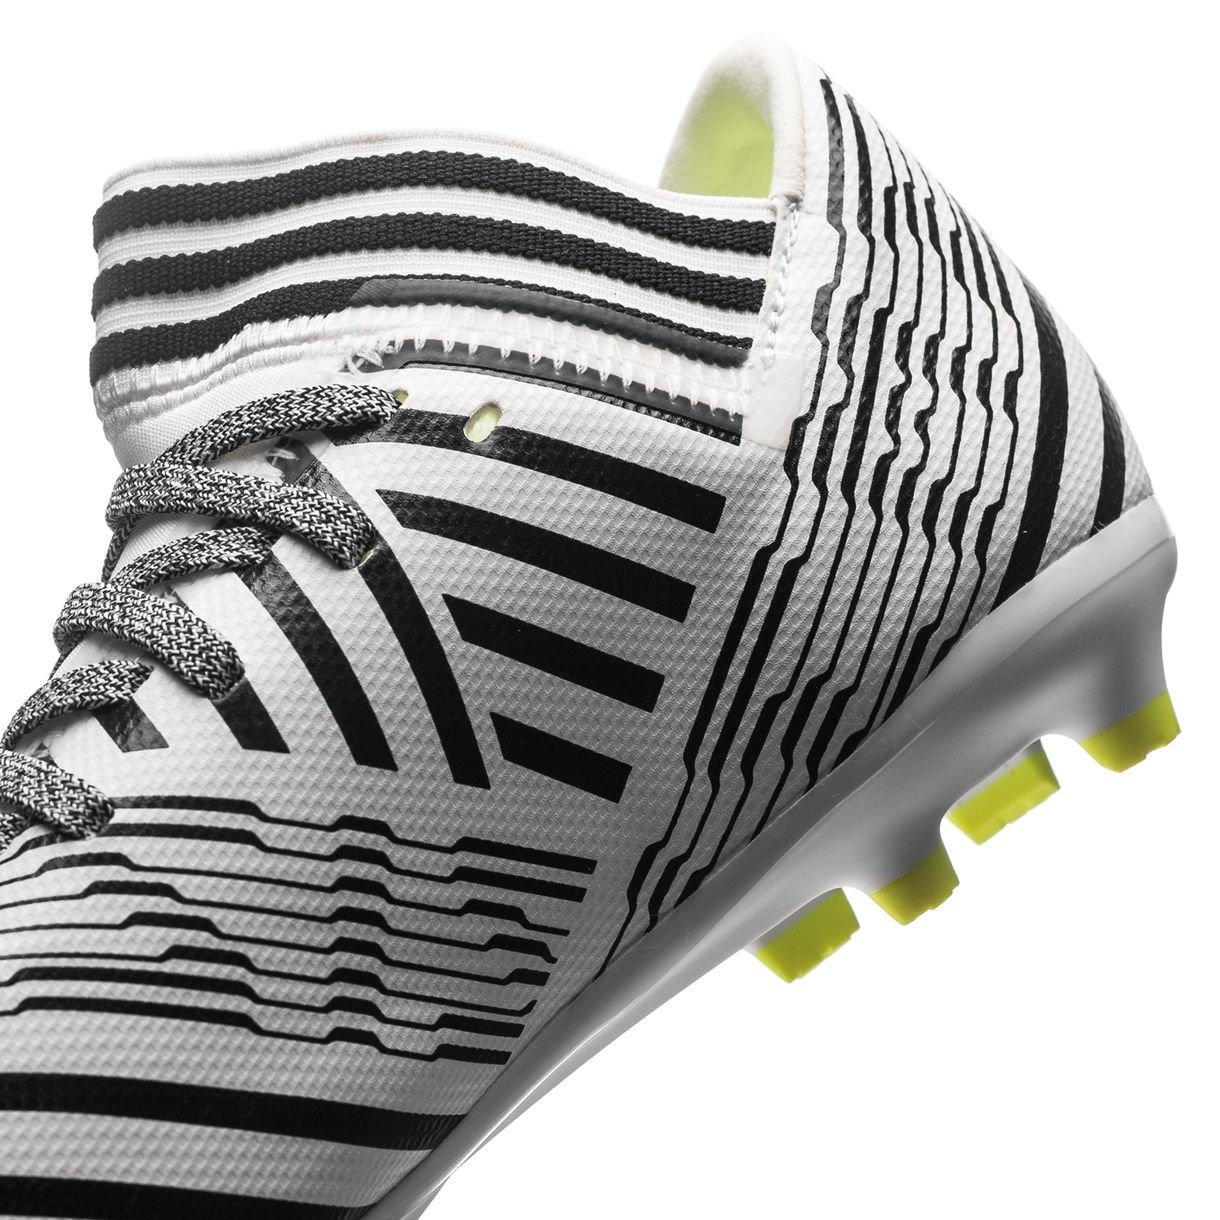 Football shoes adidas NEMEZIZ 17.3 FG J